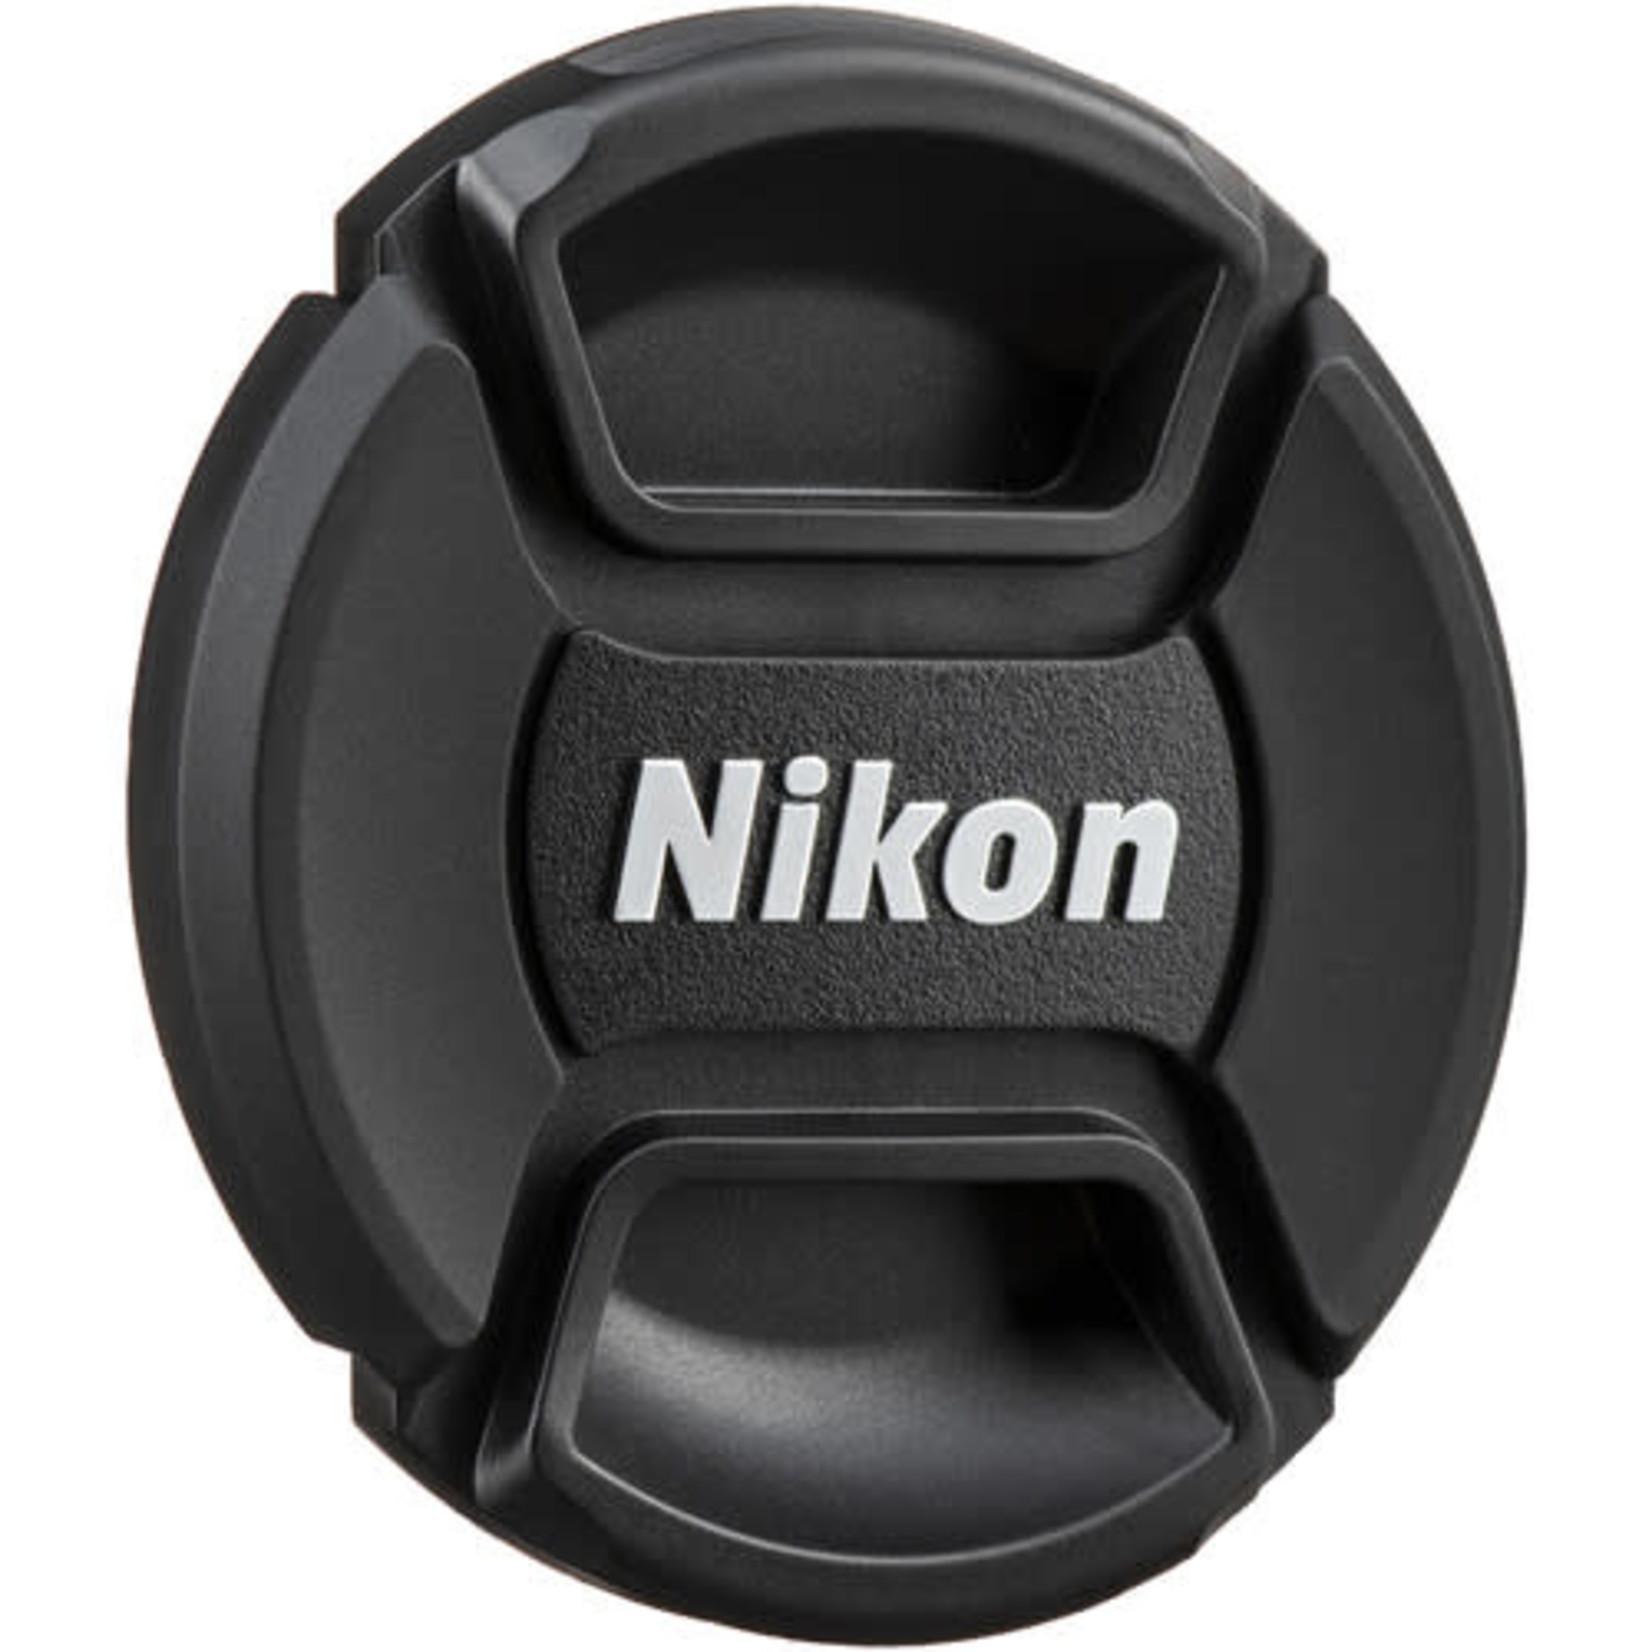 Nikon Nikon 52mm Snap-On Lens Cap